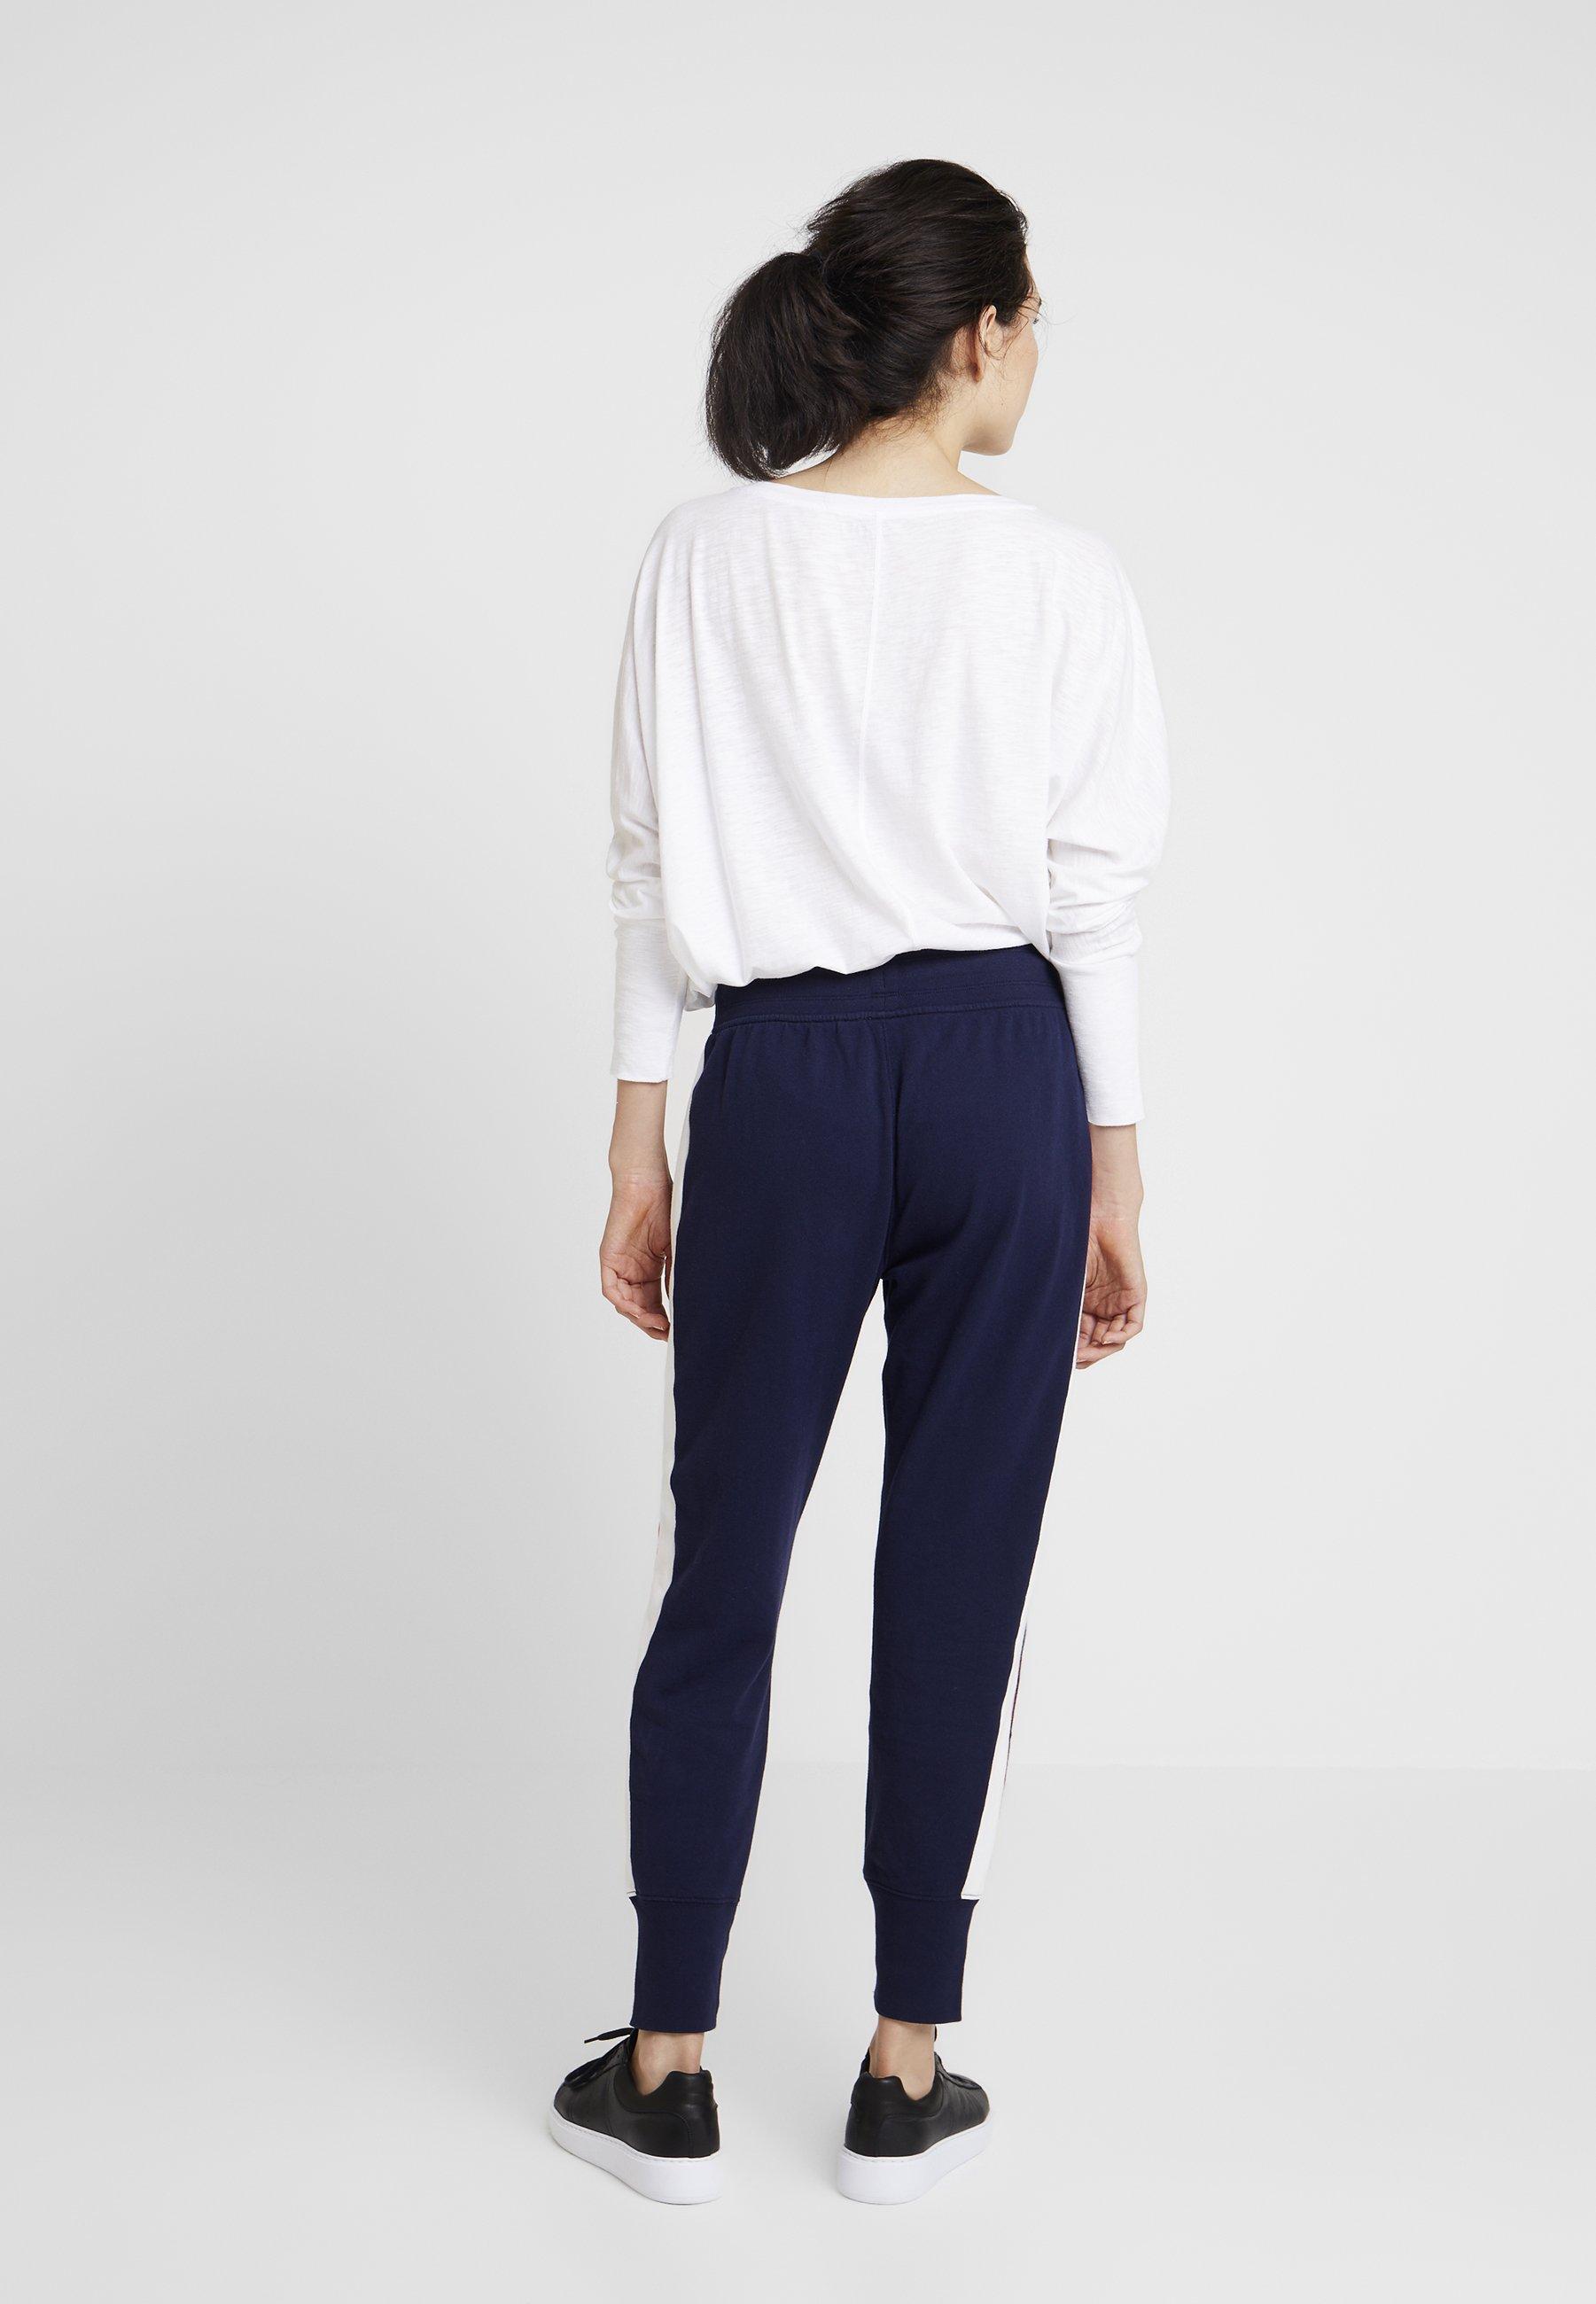 Pantalon Pantalon De De Uniform Gap Uniform Gap SurvêtementNavy SurvêtementNavy Gap De Pantalon Ok80wPn